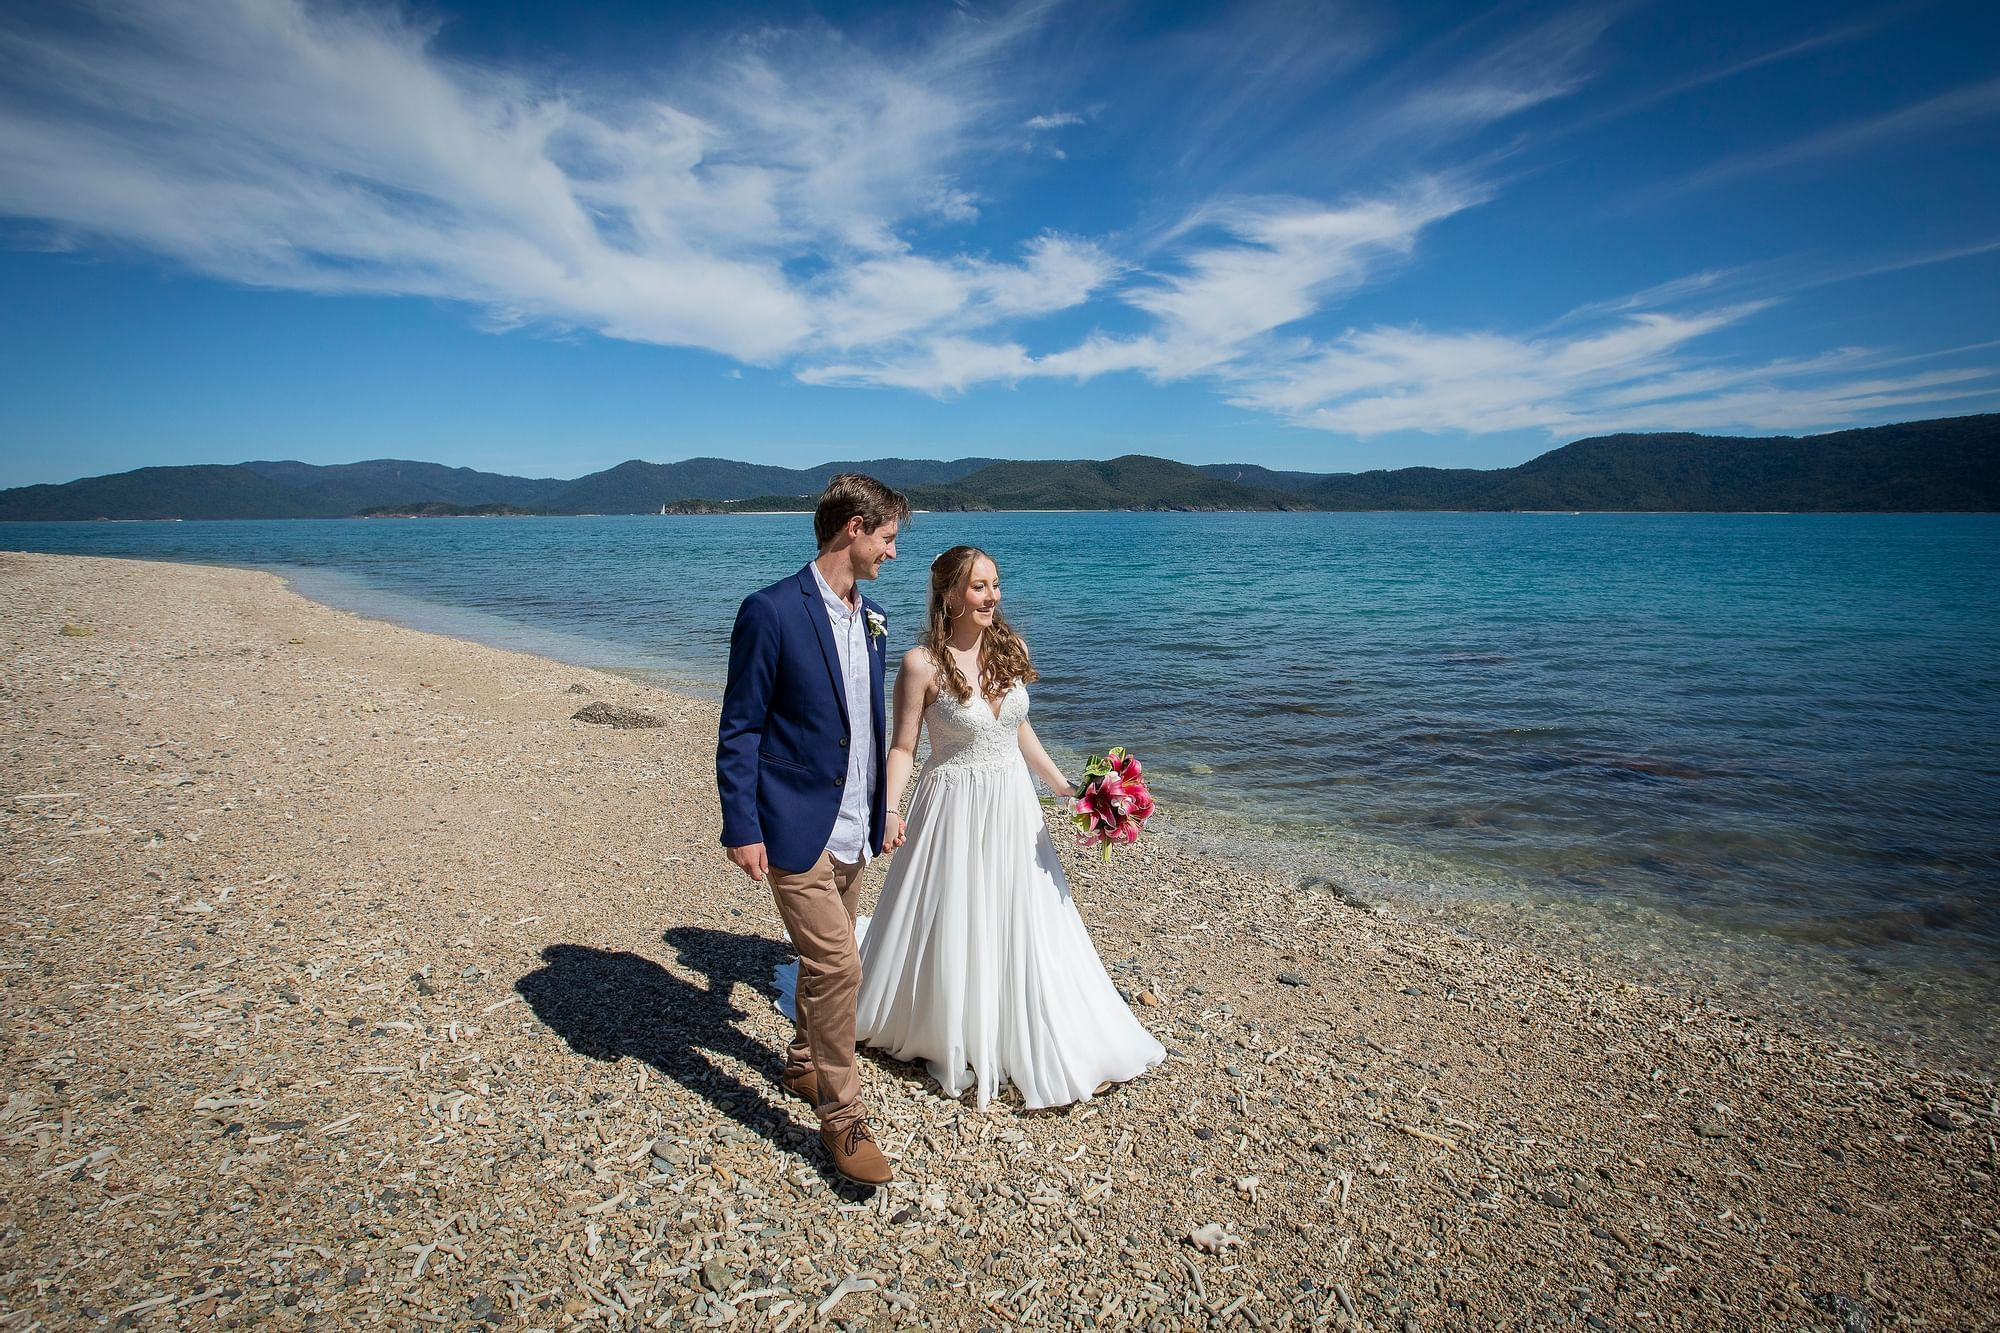 Wedded couple walking on beach at Daydream Island Resort